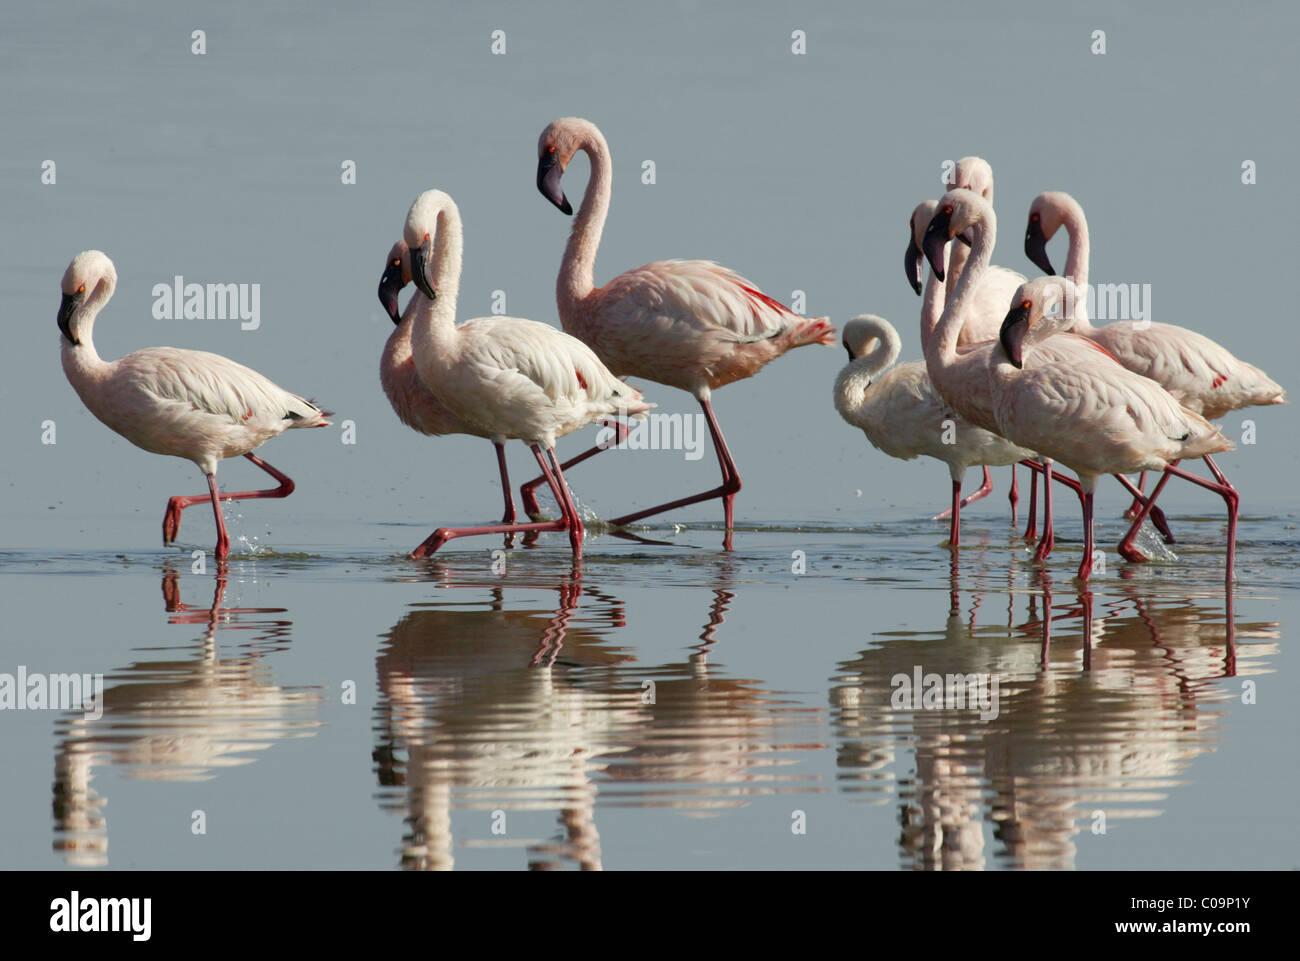 Lesser flamingos (Phoenicopterus minor), courtship display, Lake Nakuru, Kenya, Africa Stock Photo